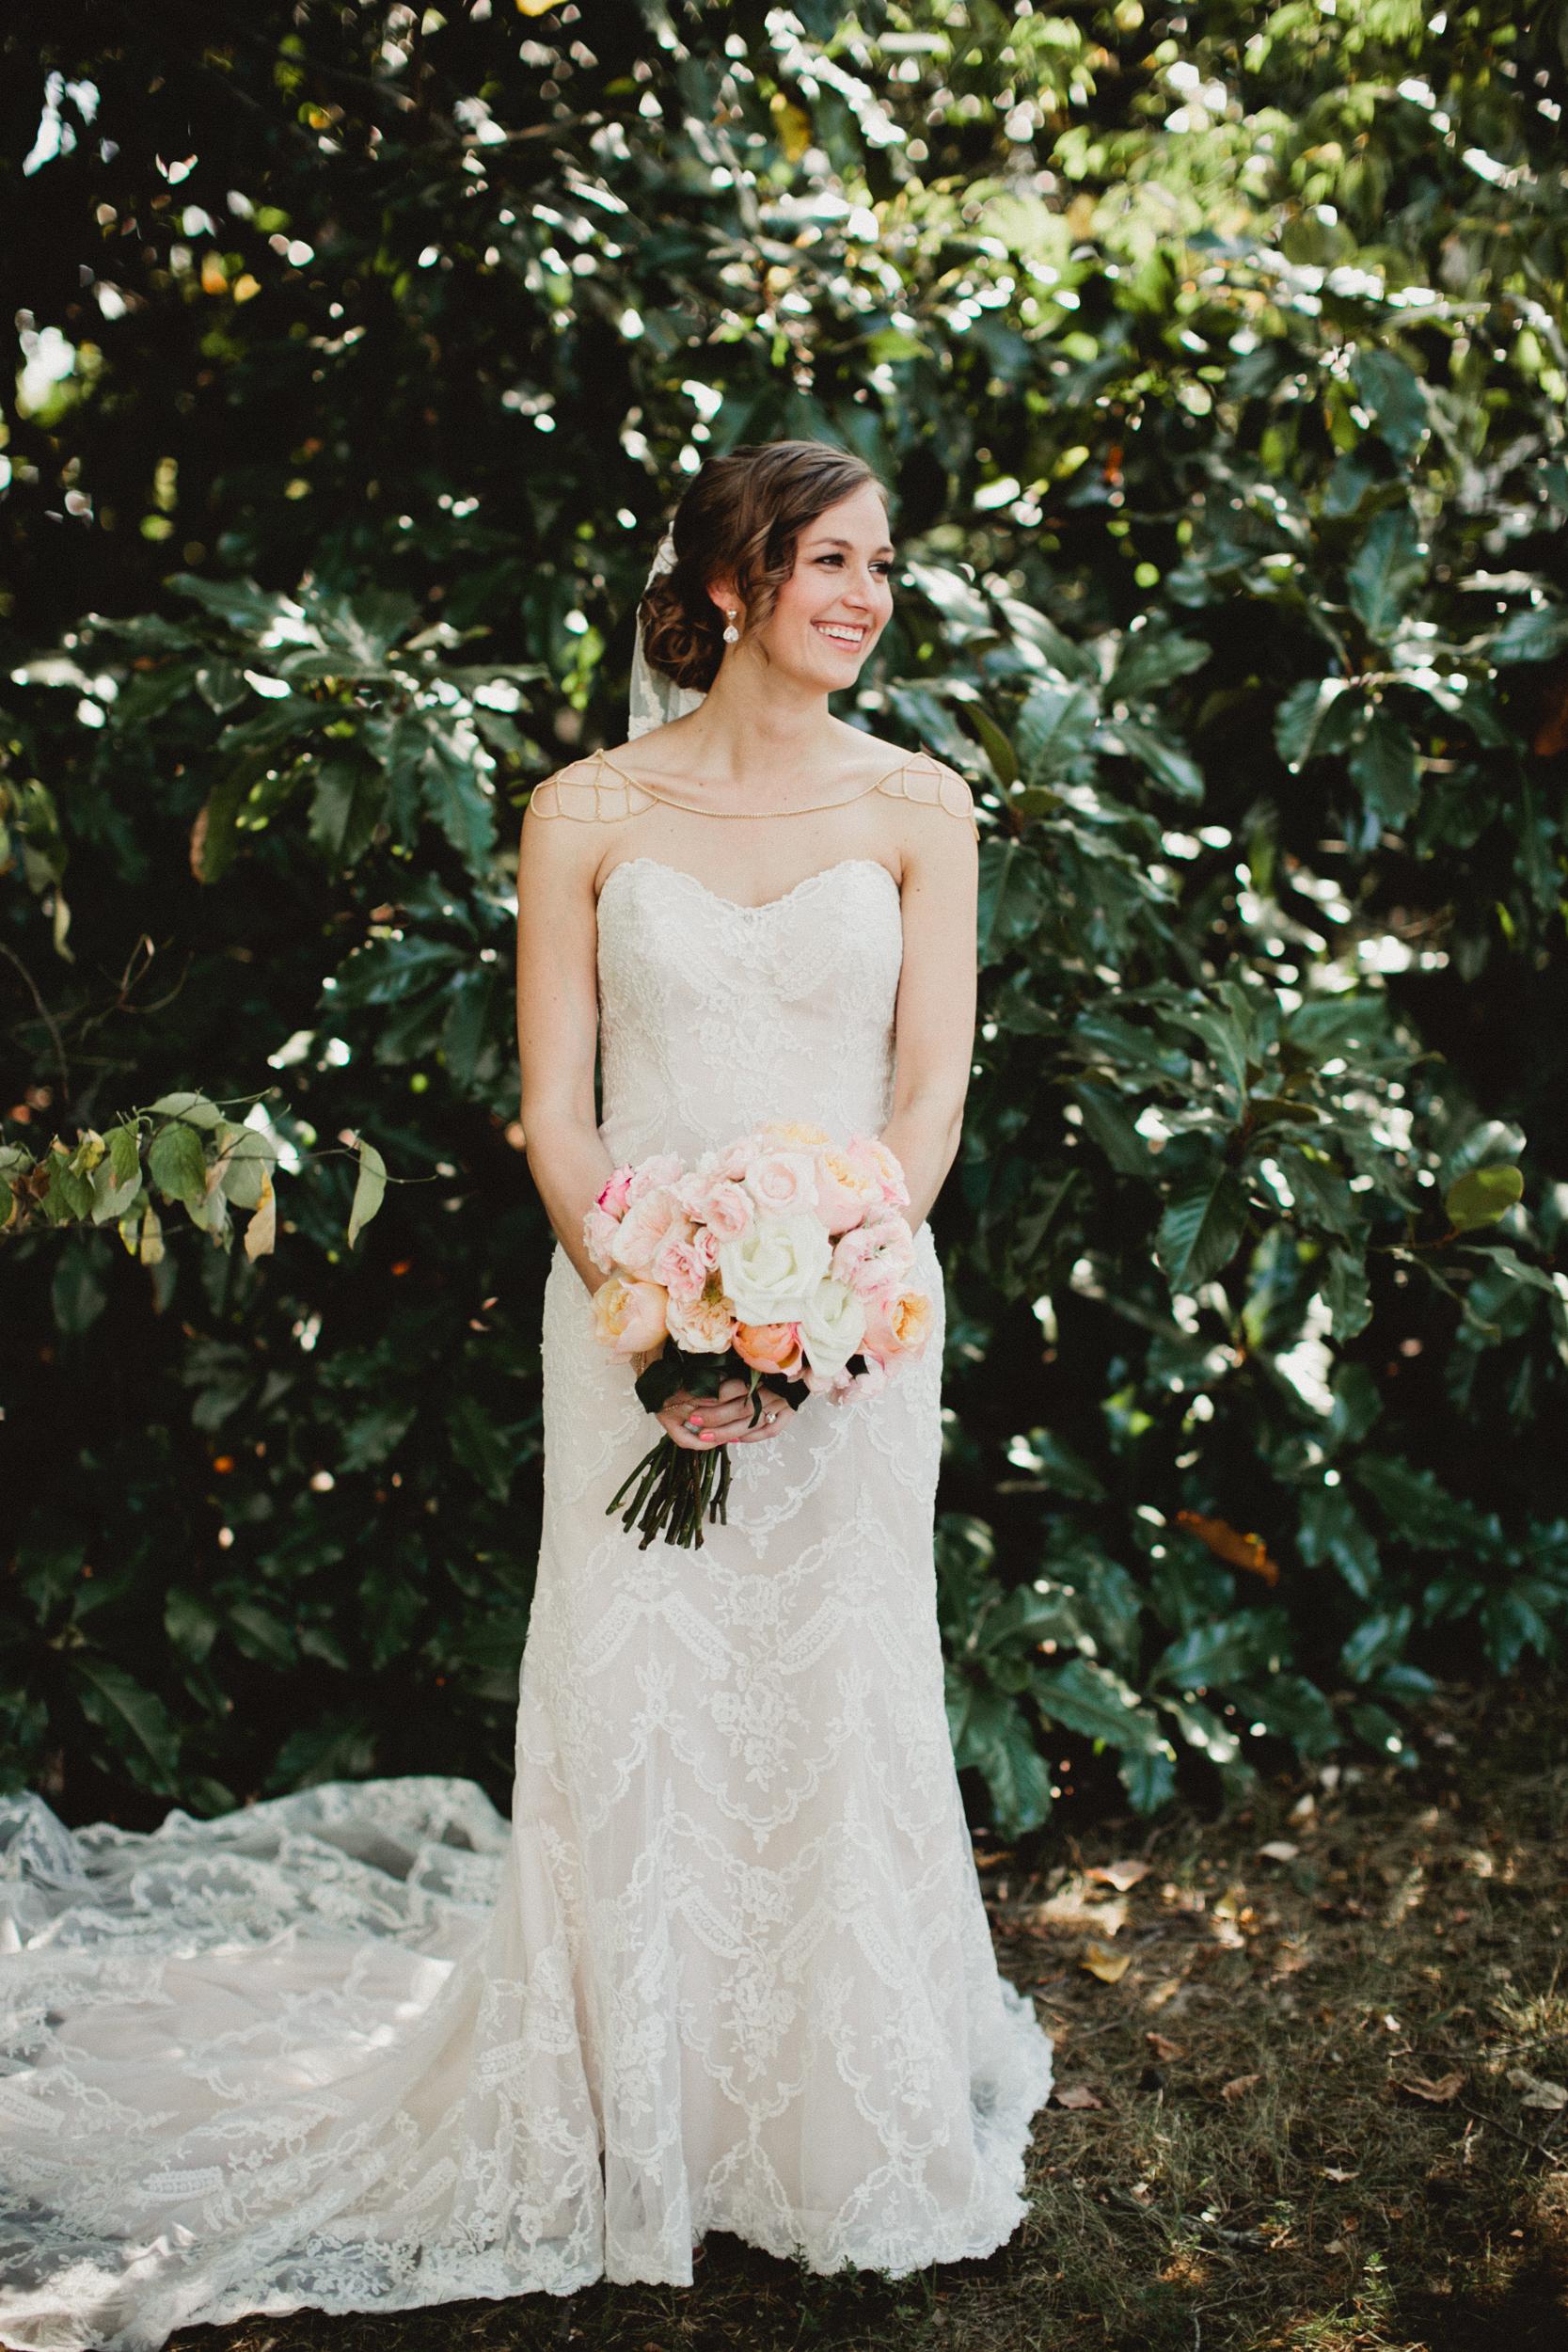 Maine-Wedding-Photographer-992.jpg